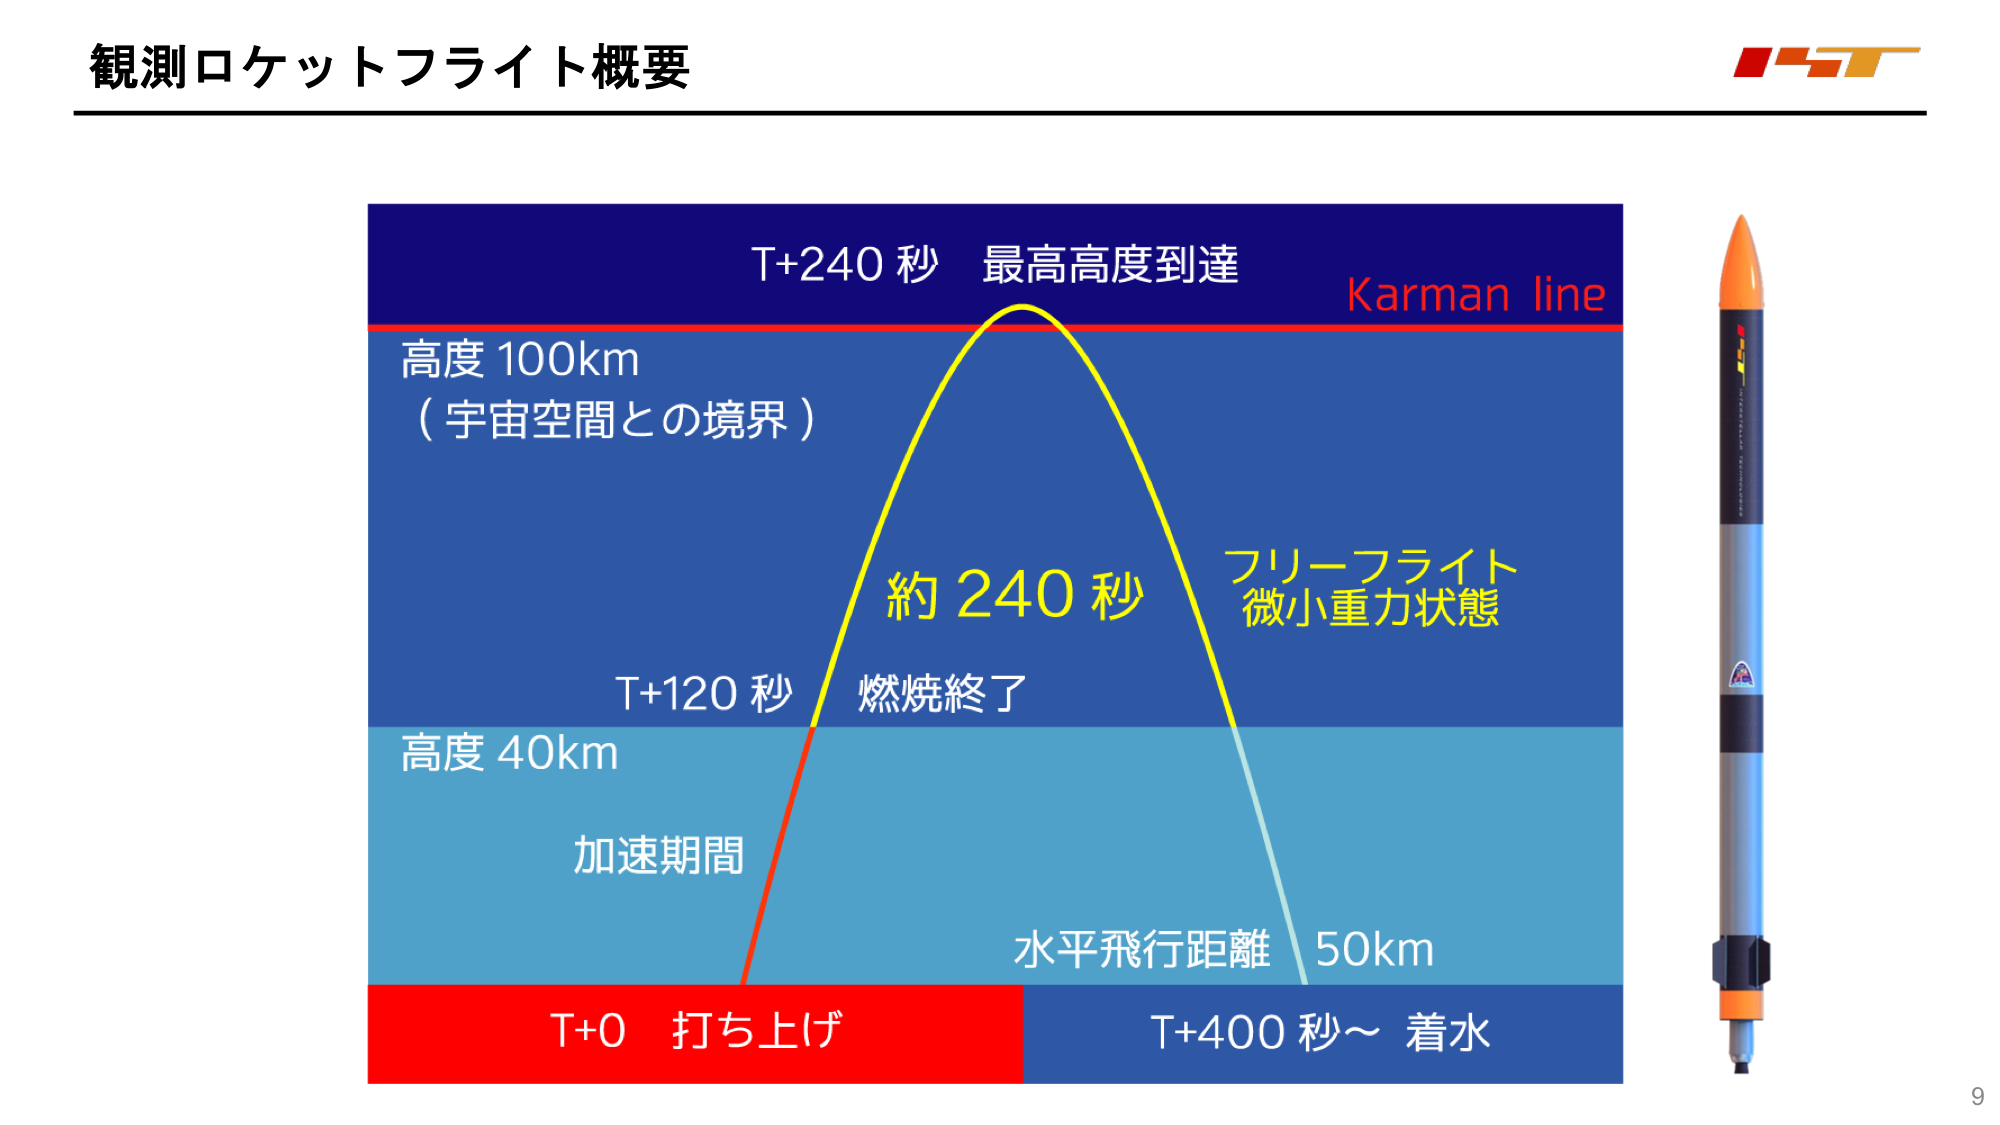 f:id:Imamura:20200603232755p:plain